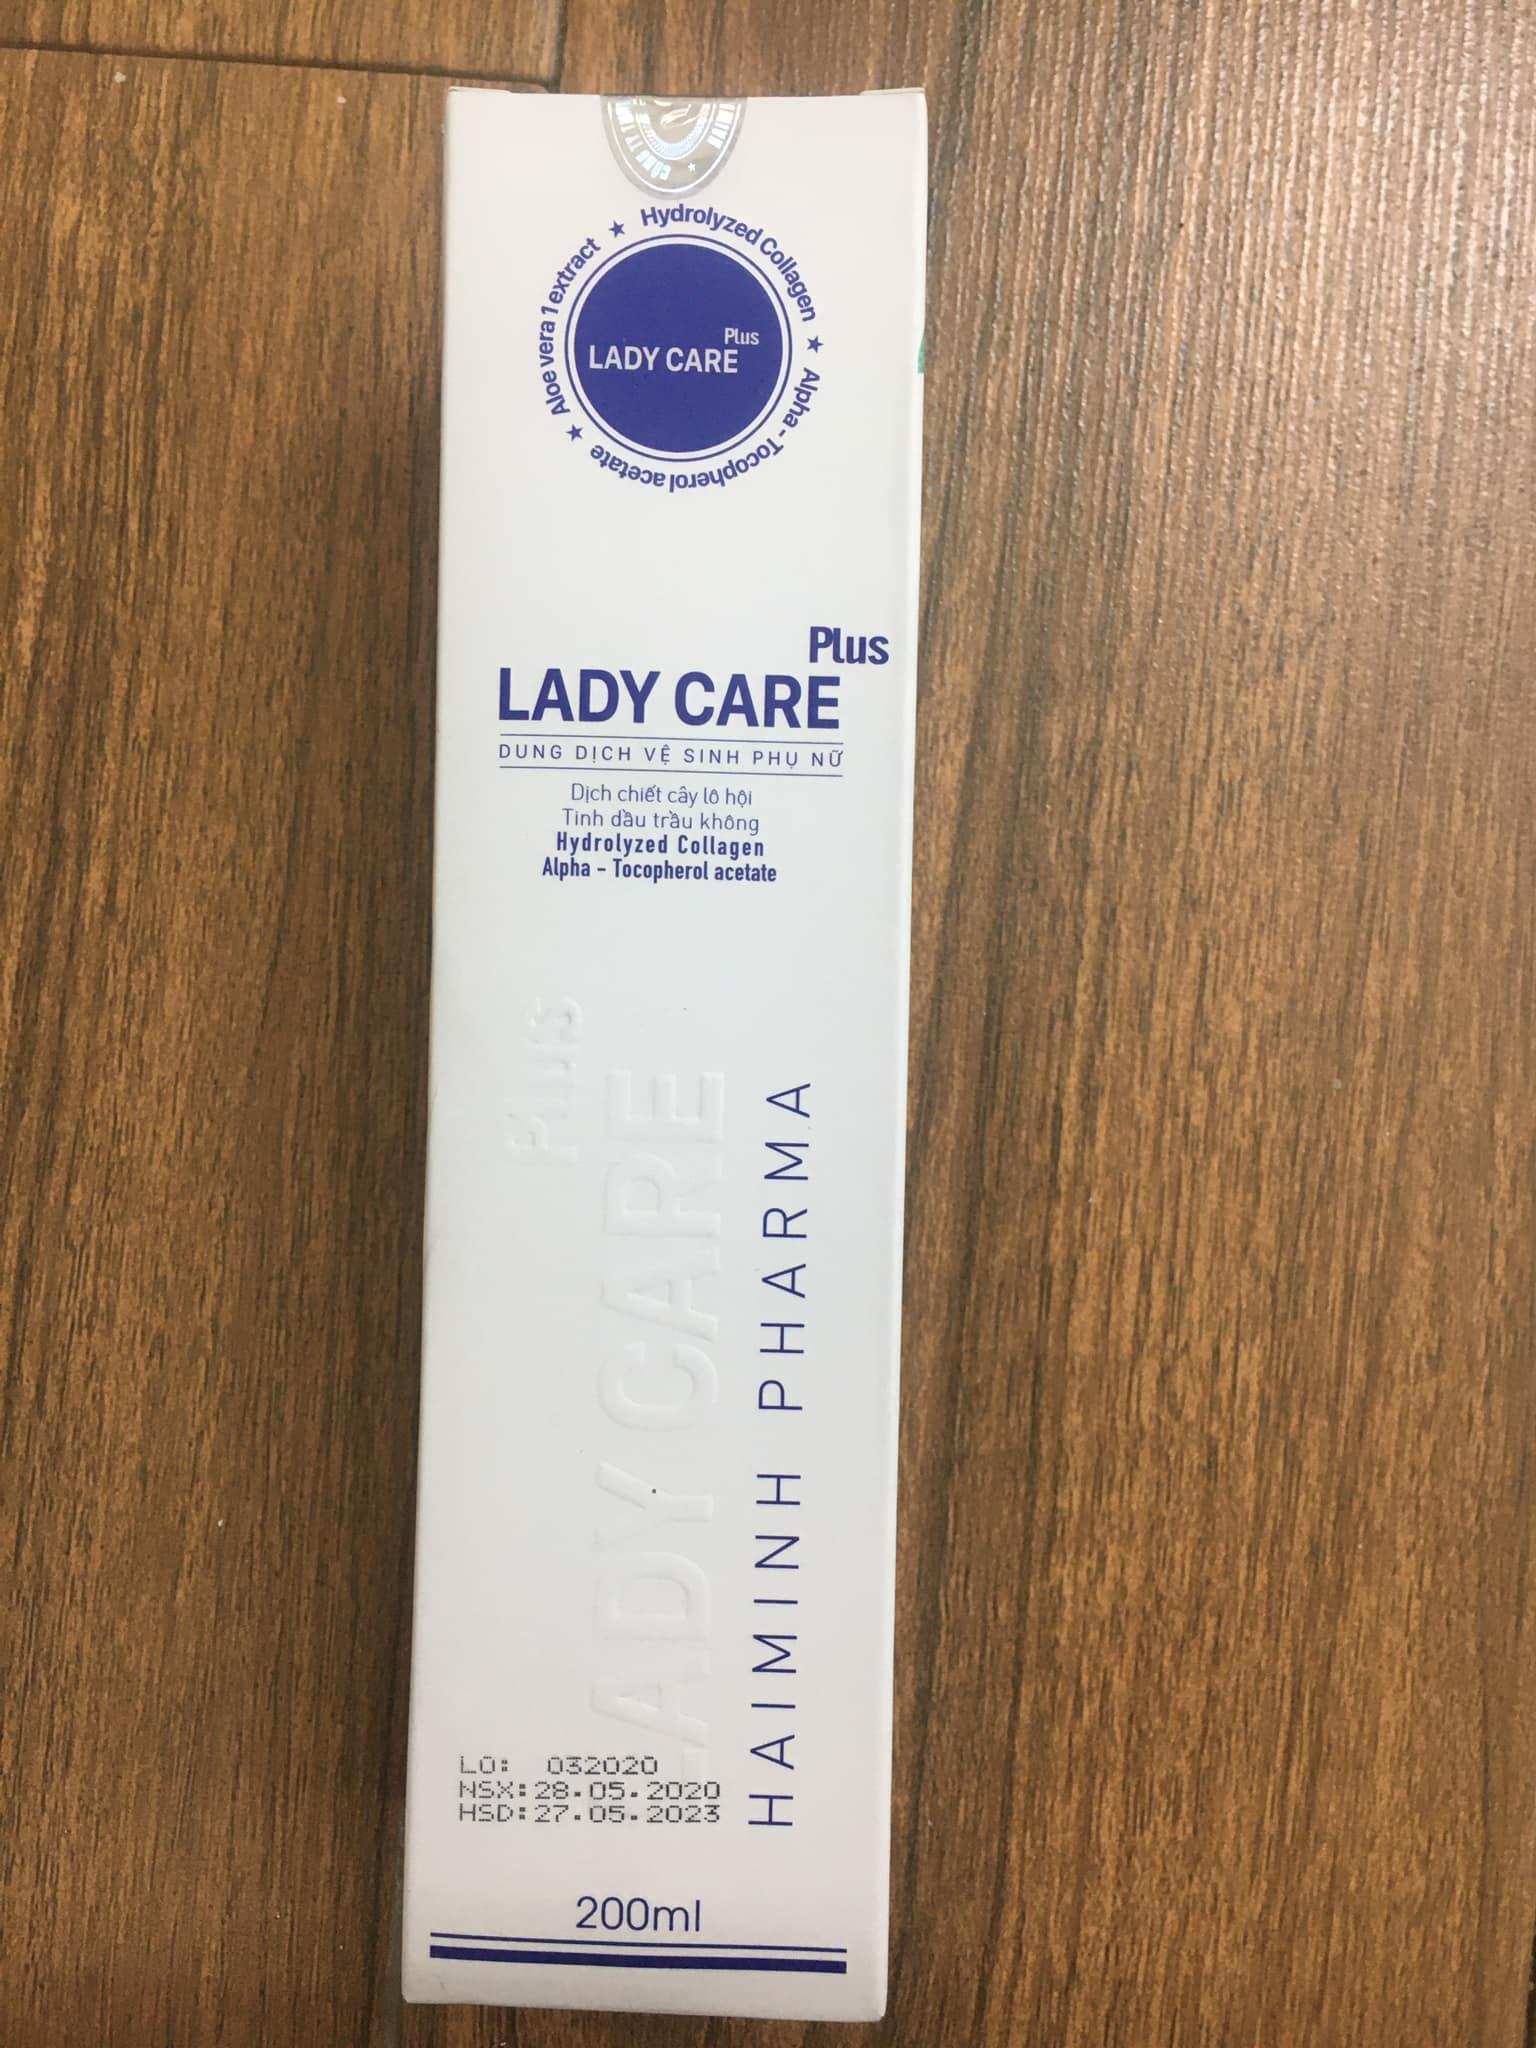 Lady Care Plus